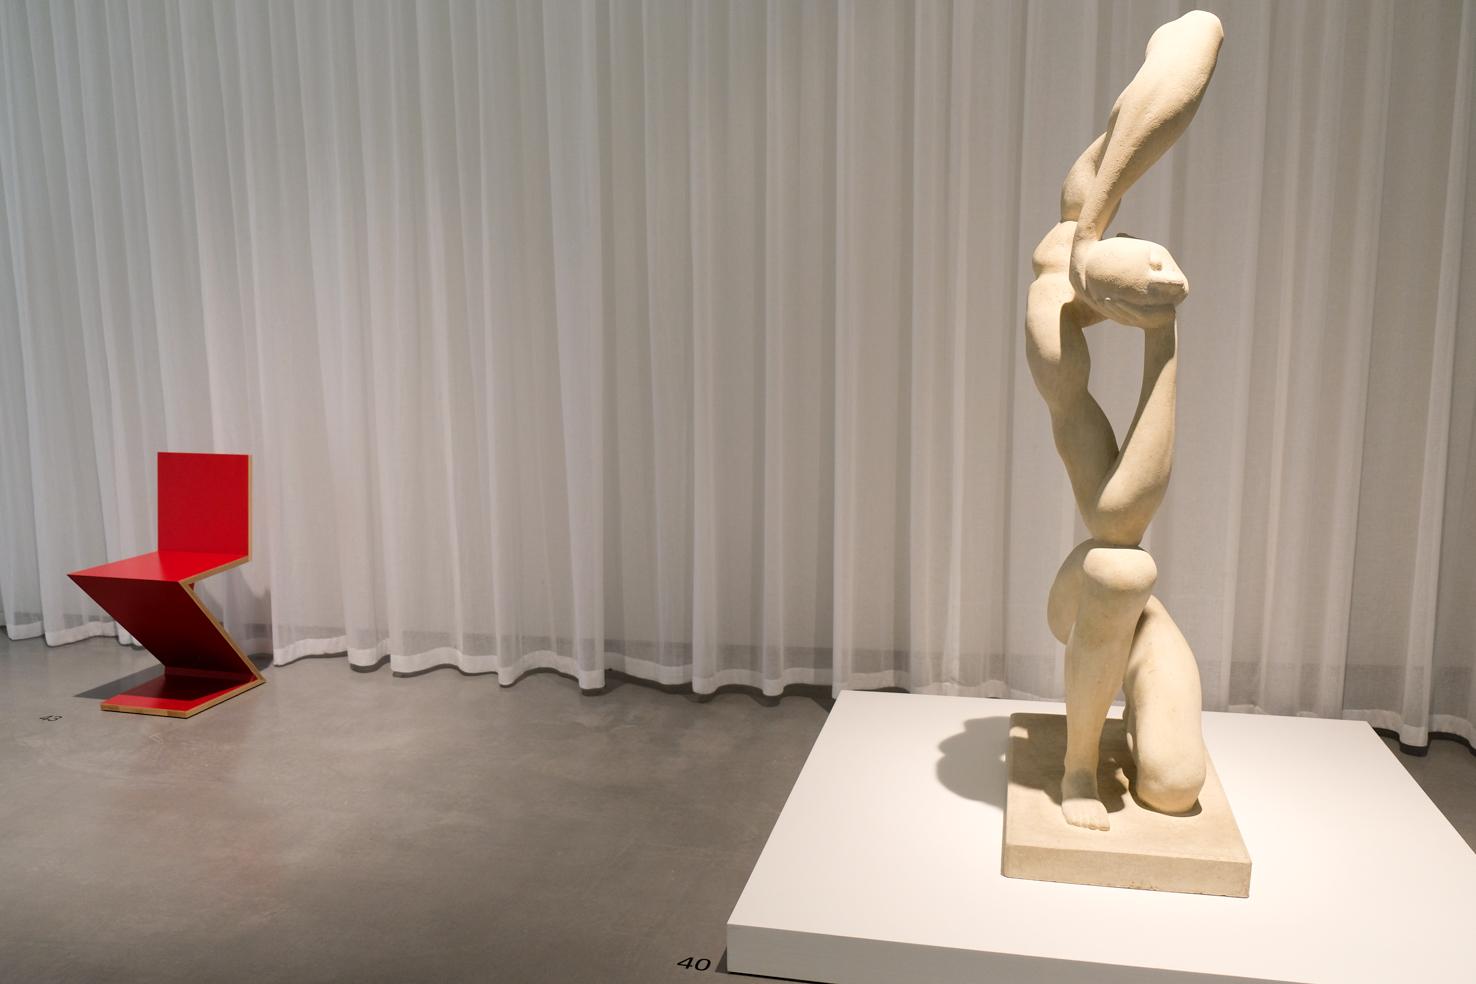 16 F.E. McWilliam Kneeling Figure 1947 Gerrit Rietveld Zig Zag chair 1934